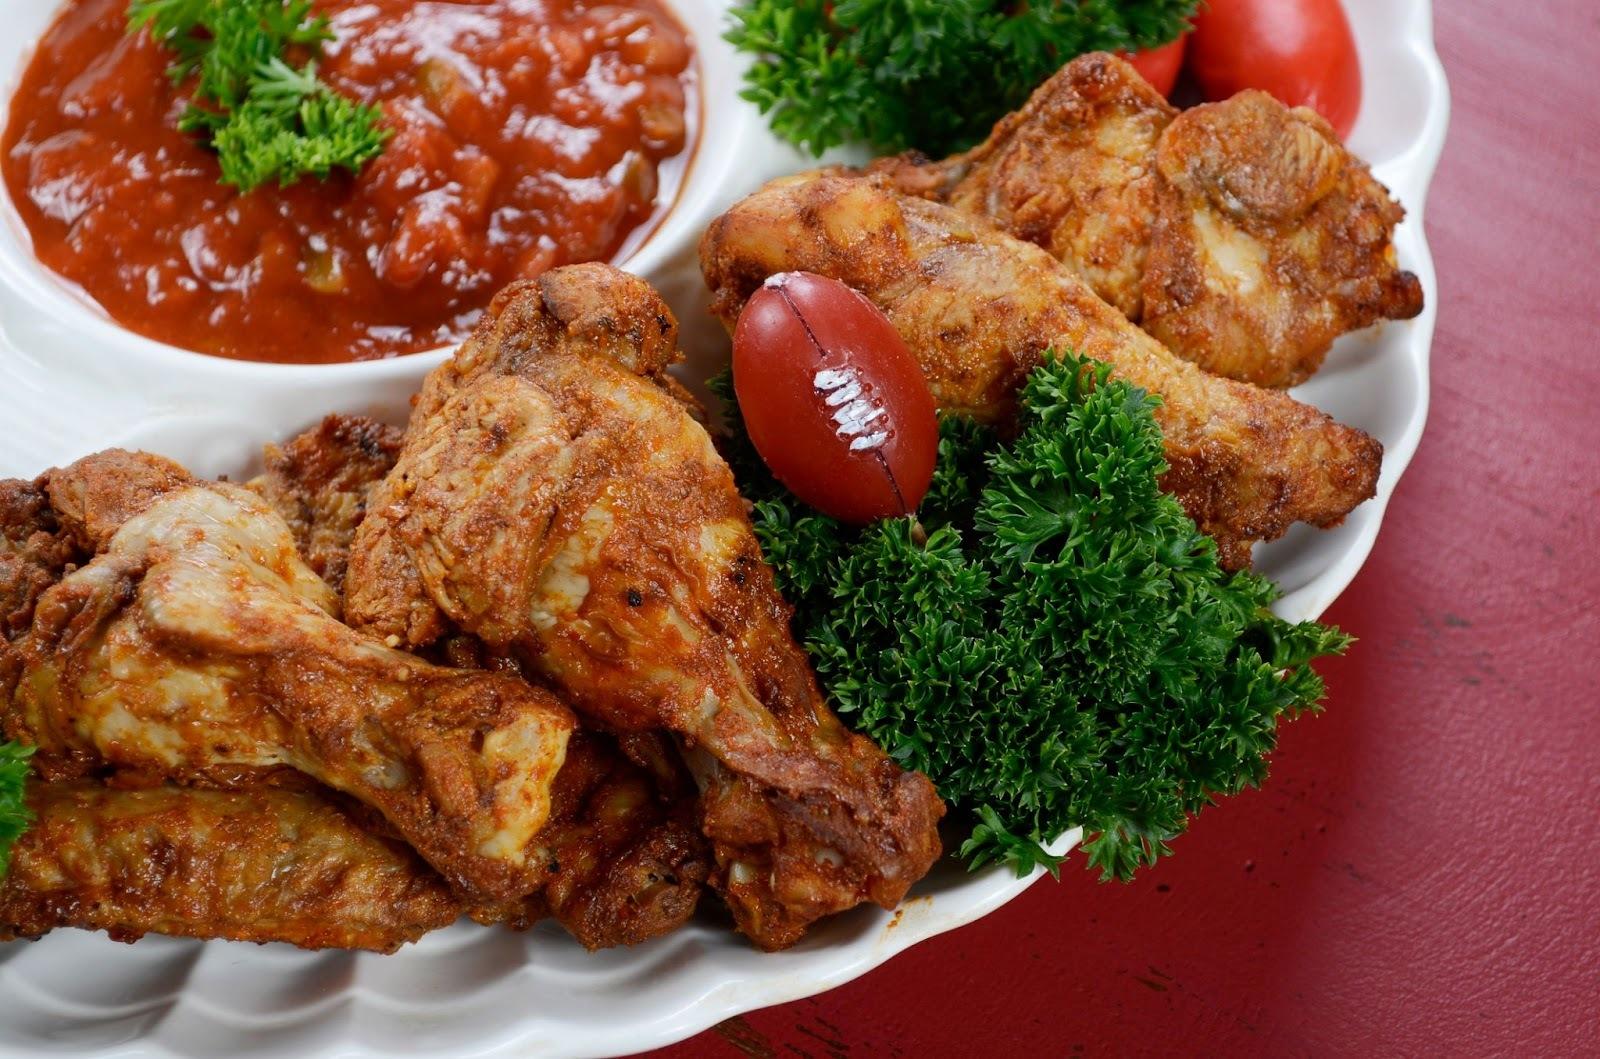 Chicken wings arranged on a platter as keto football snacks.